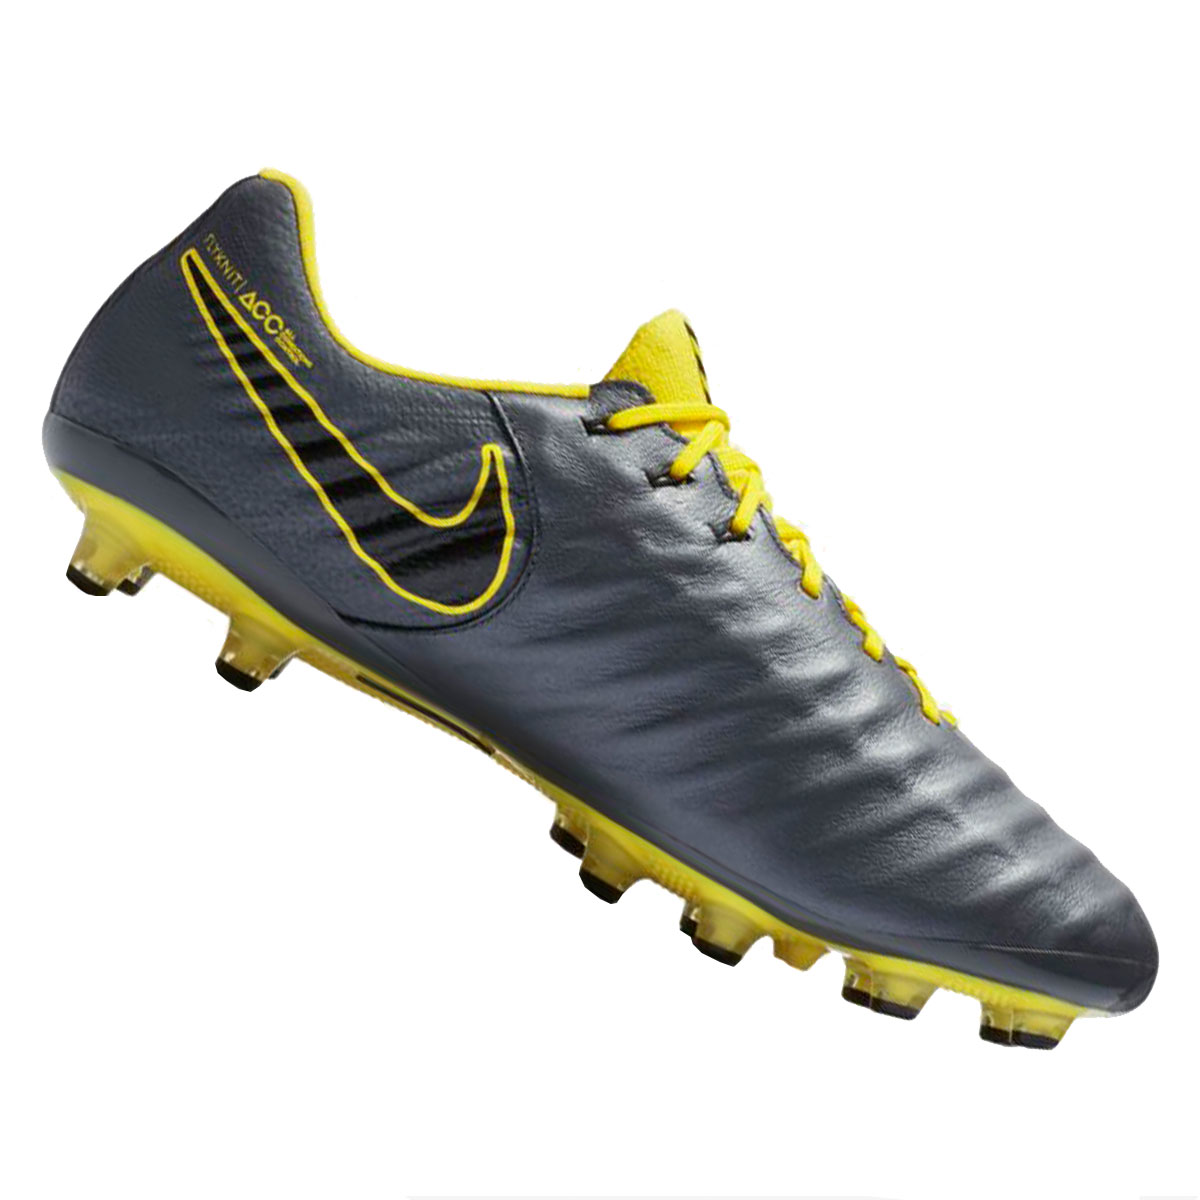 Nike Fußballschuh Tiempo Legend VII Elite AG Pro Kunstrasen dunkelgraugelb